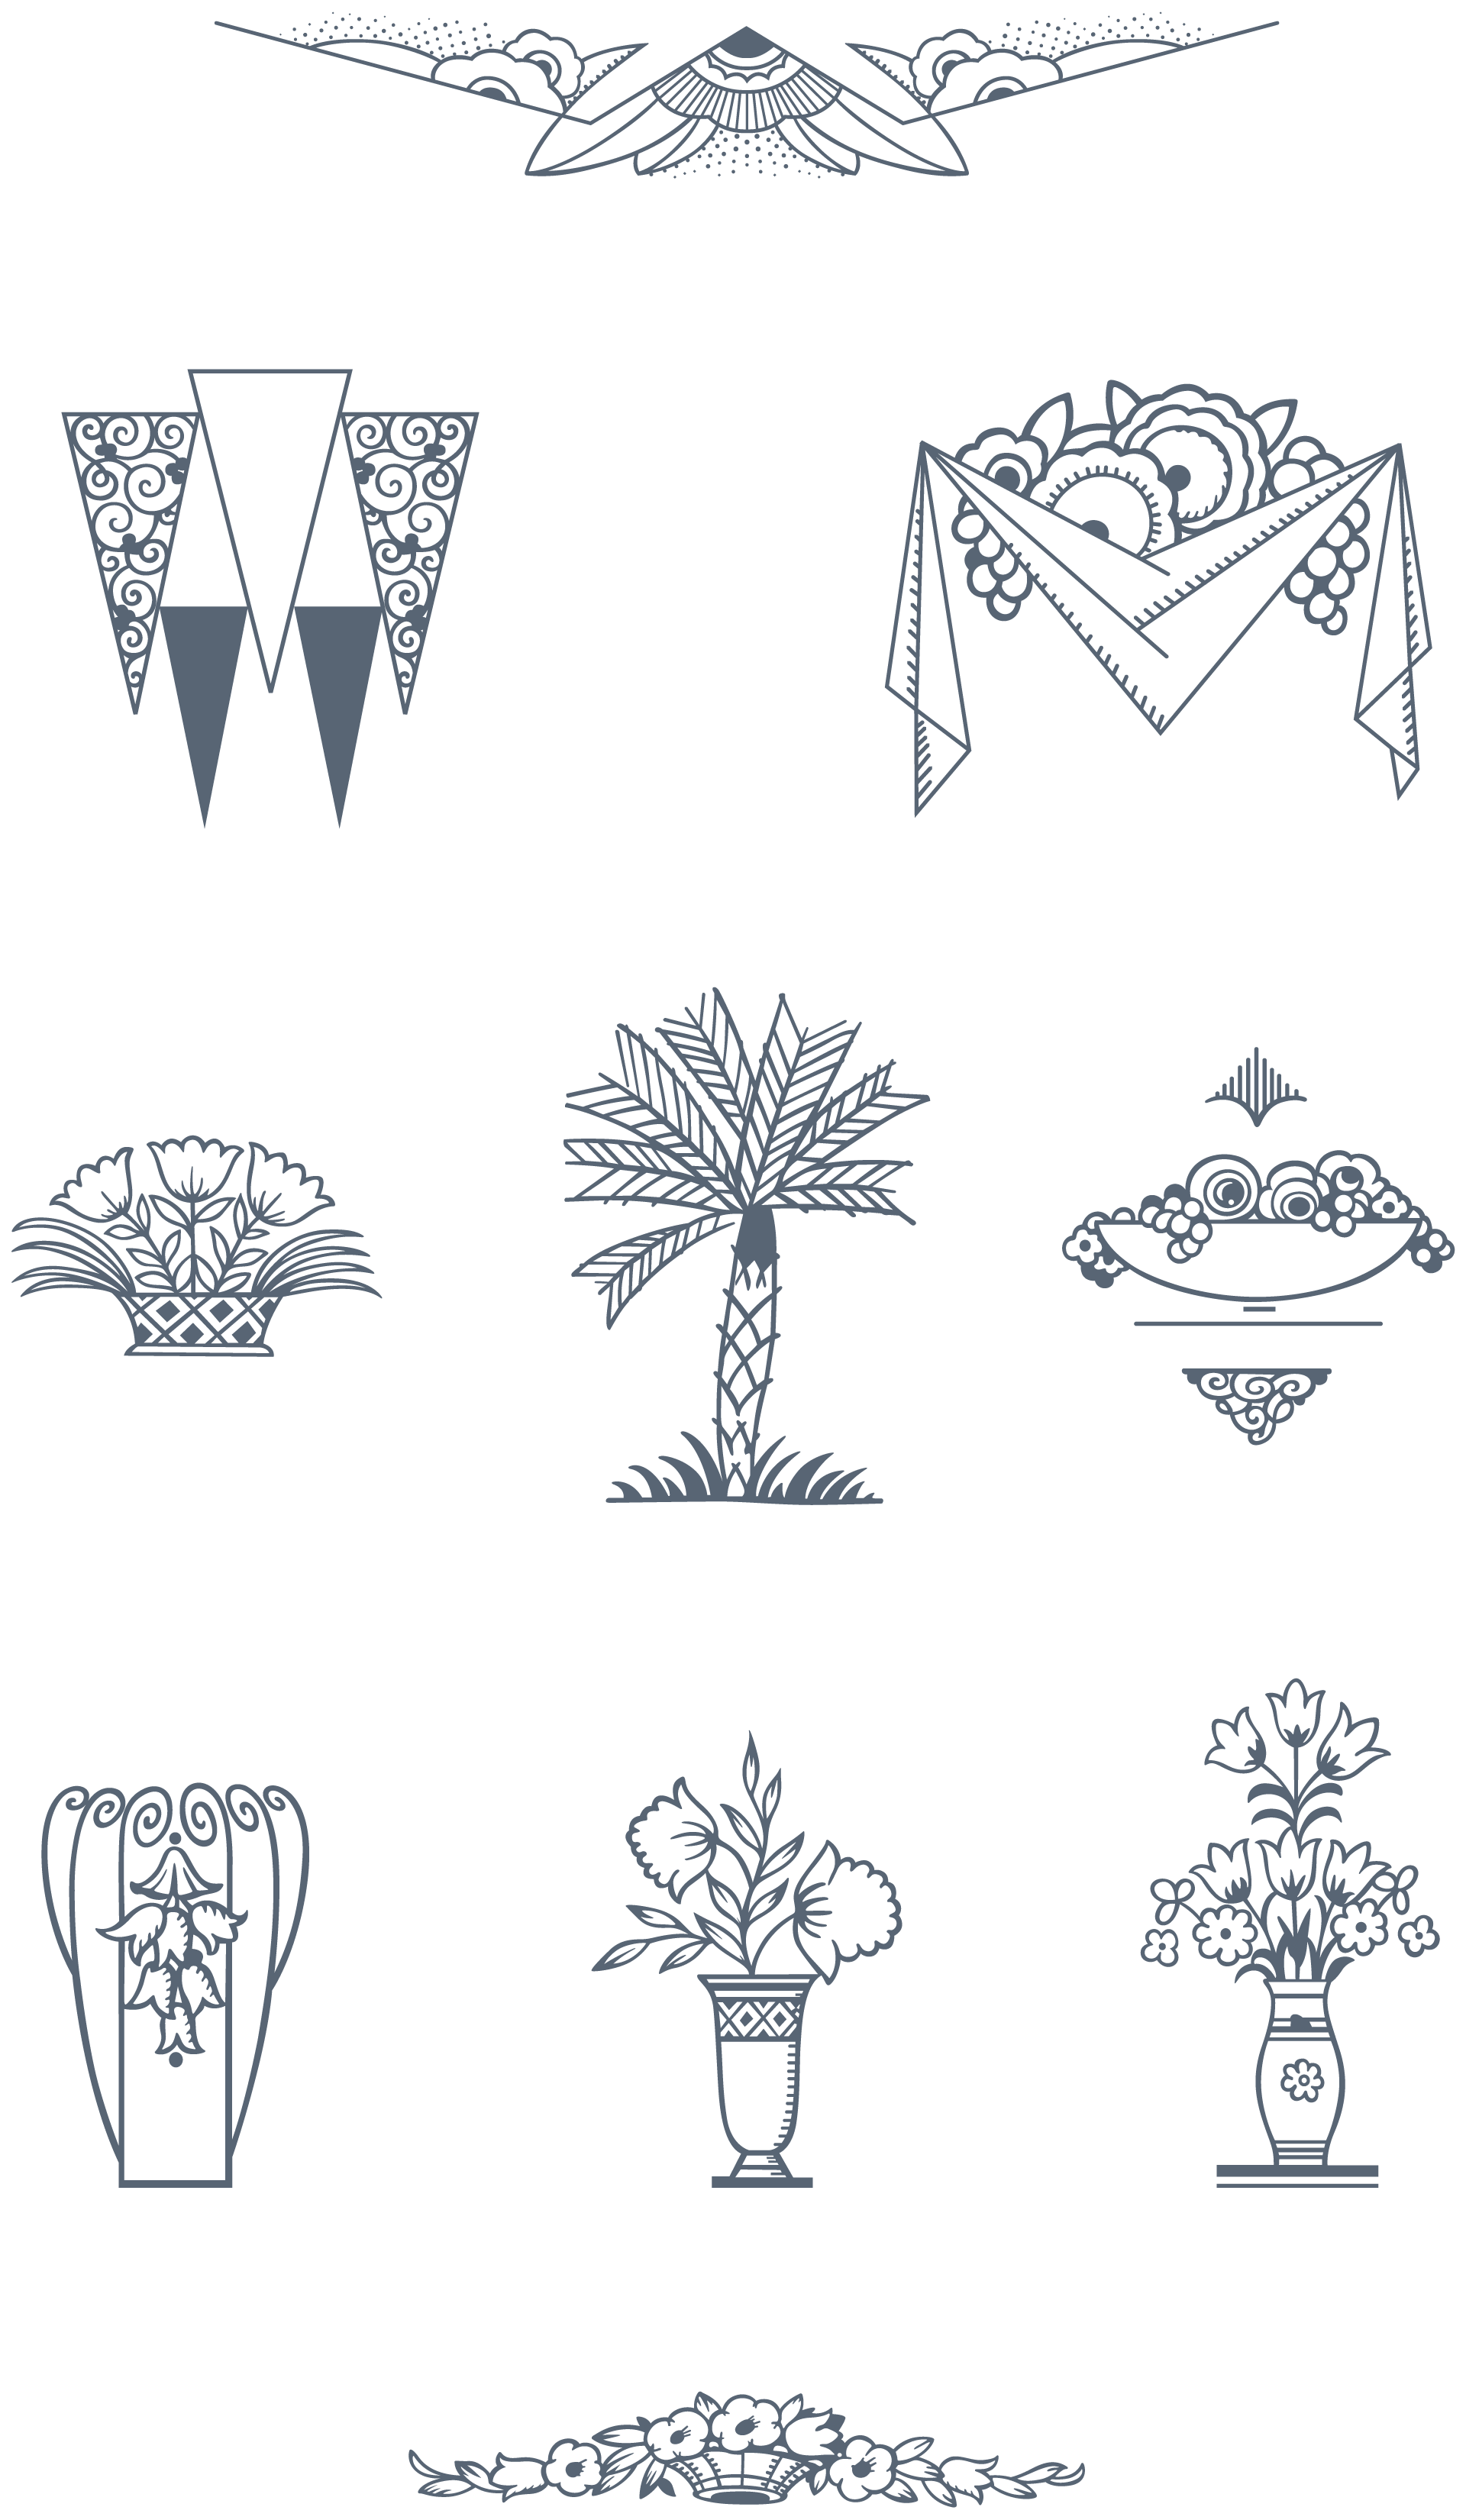 Art deco vectors clipart vector freeuse stock Ultimate Art Deco vector Pack: 275 Decorative Frames, 70 ... vector freeuse stock